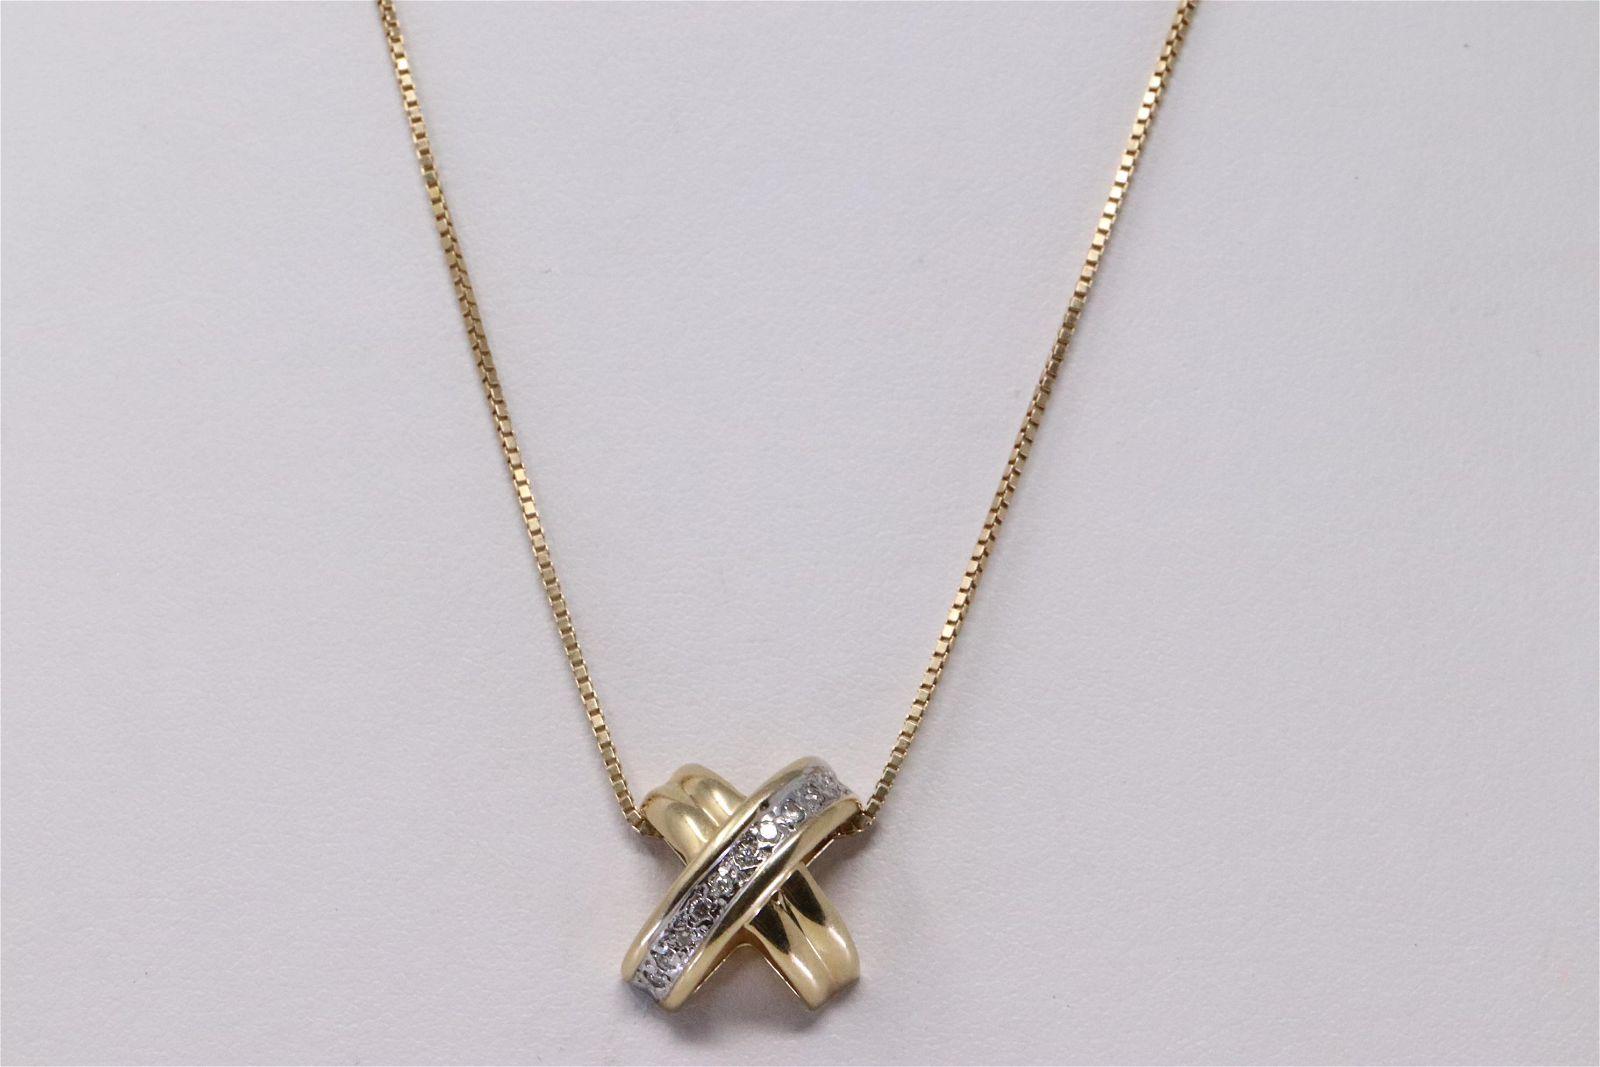 14Kt Yellow Gold Diamond Pendant Necklace.